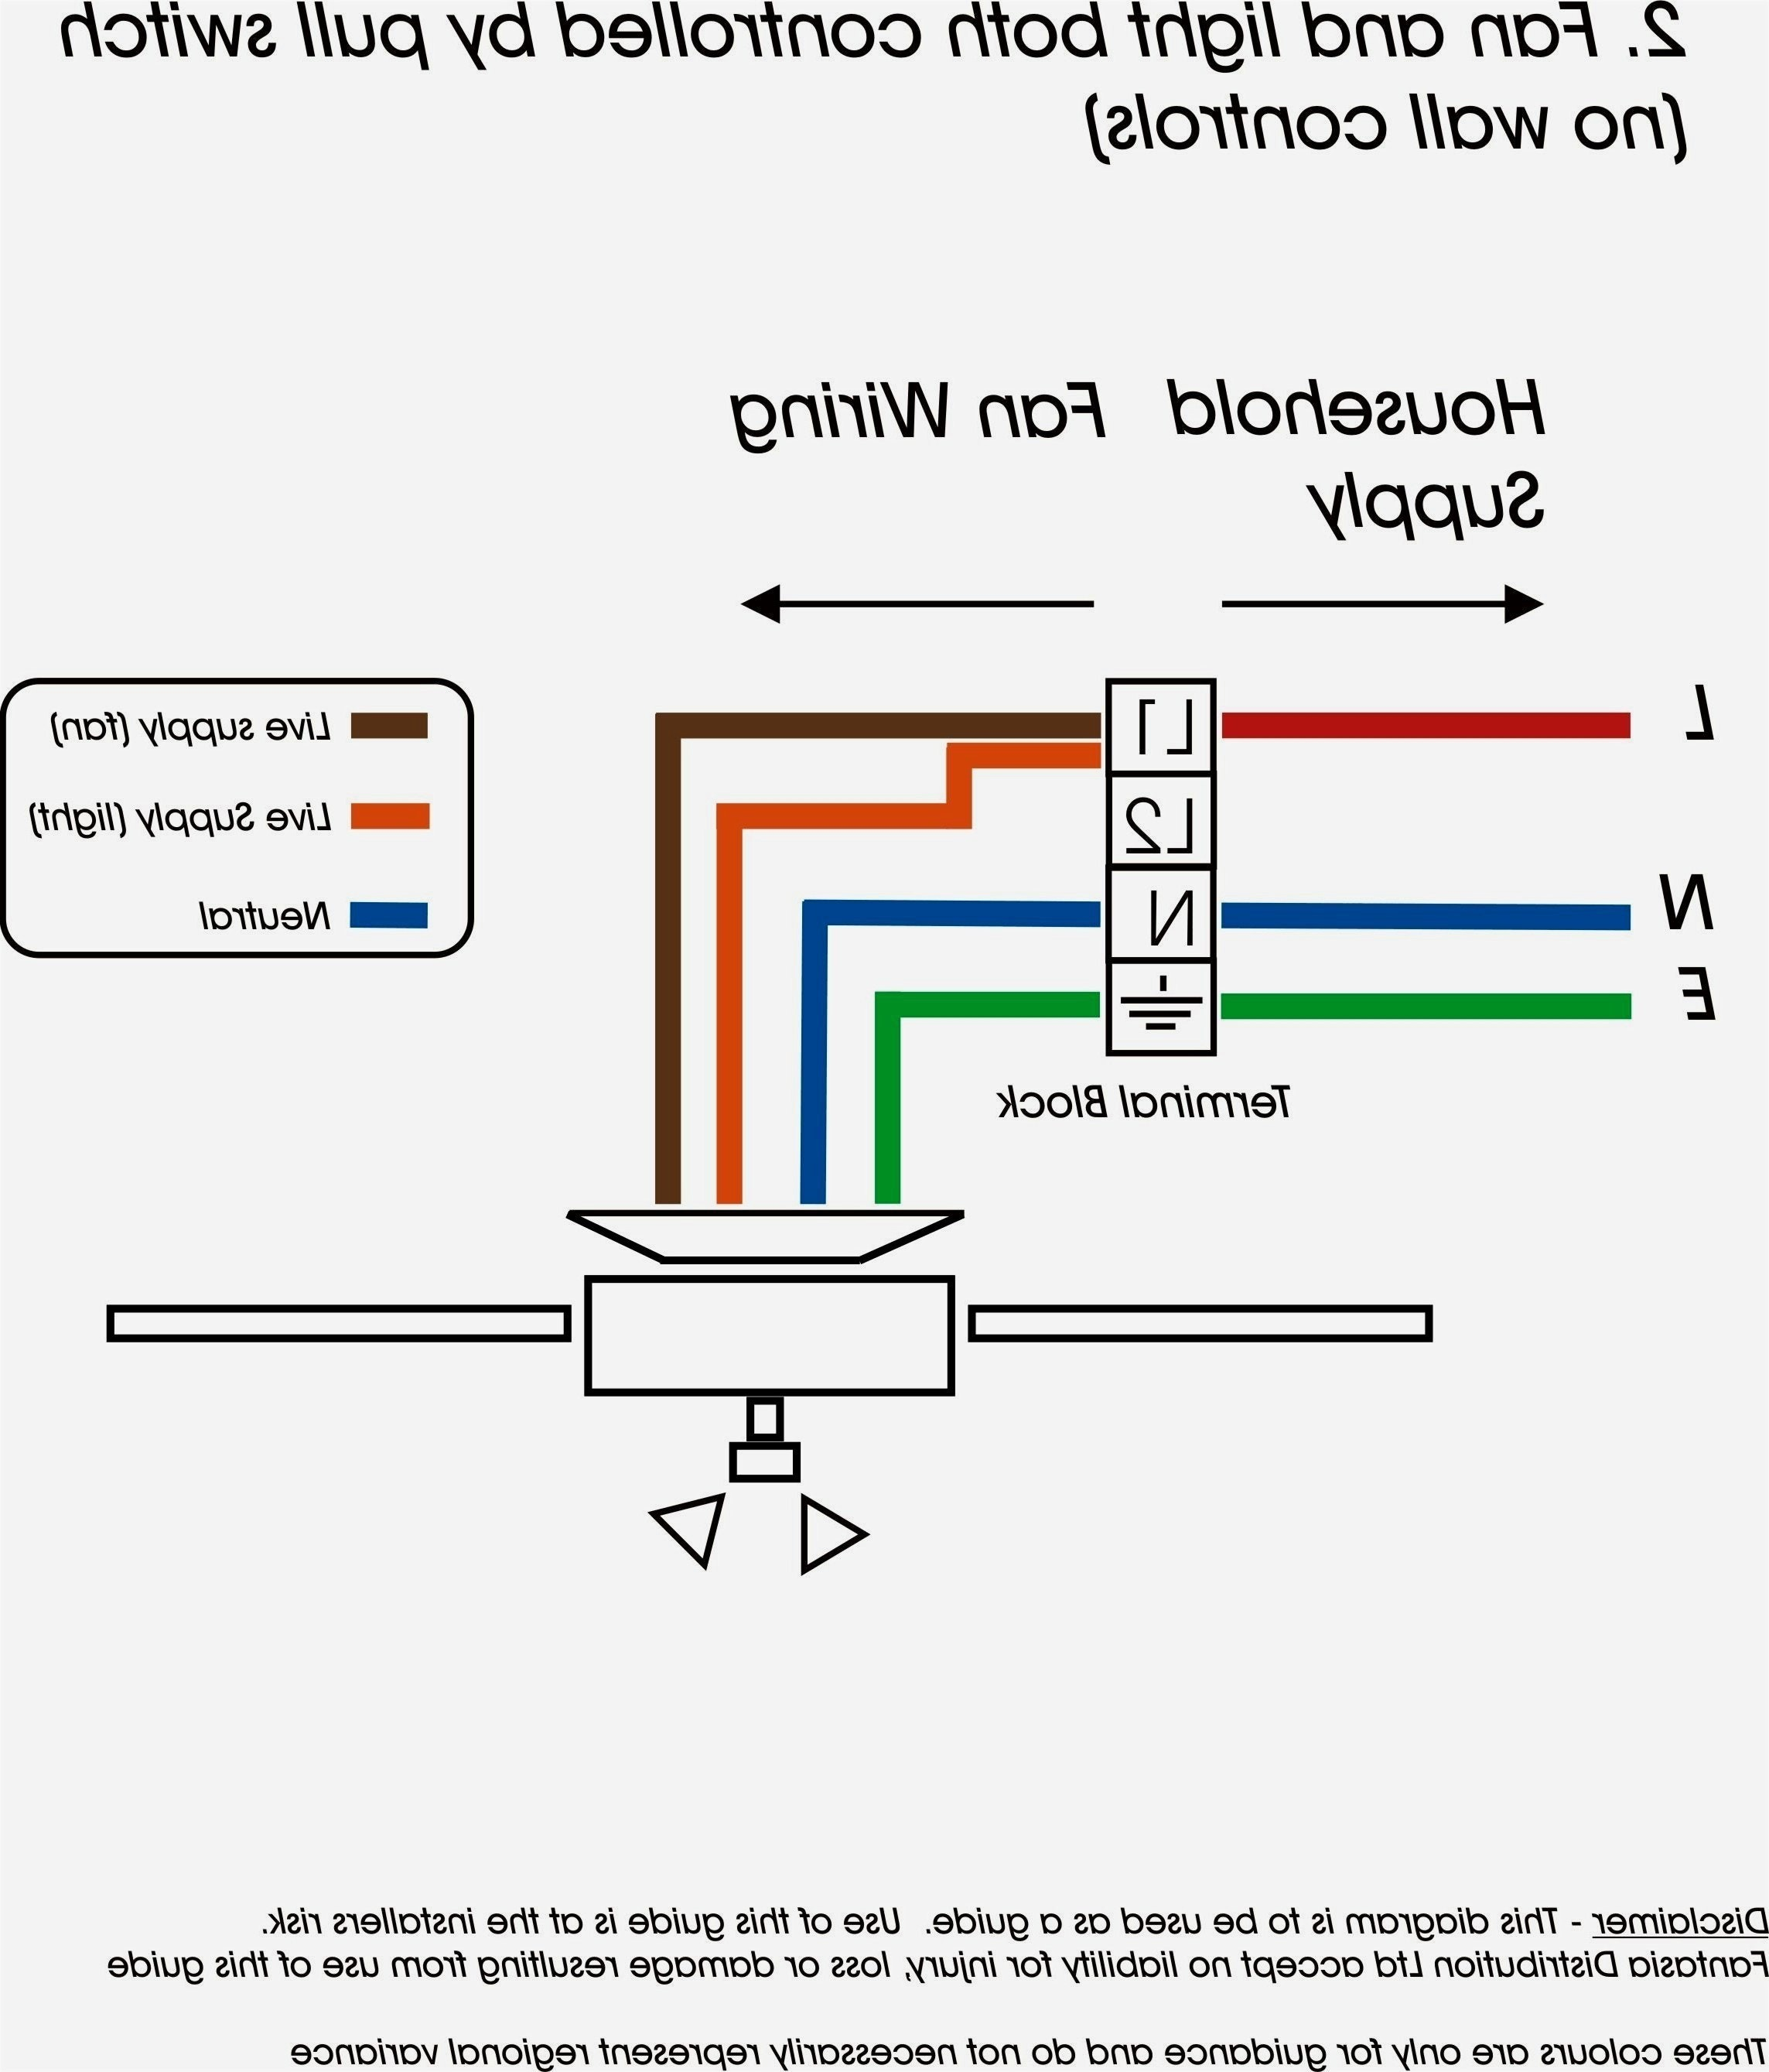 Wiring Diagram Leeson Electric Motor Inspirationa Wiring Diagram Franklin Electric Motor New Wiring Diagram for